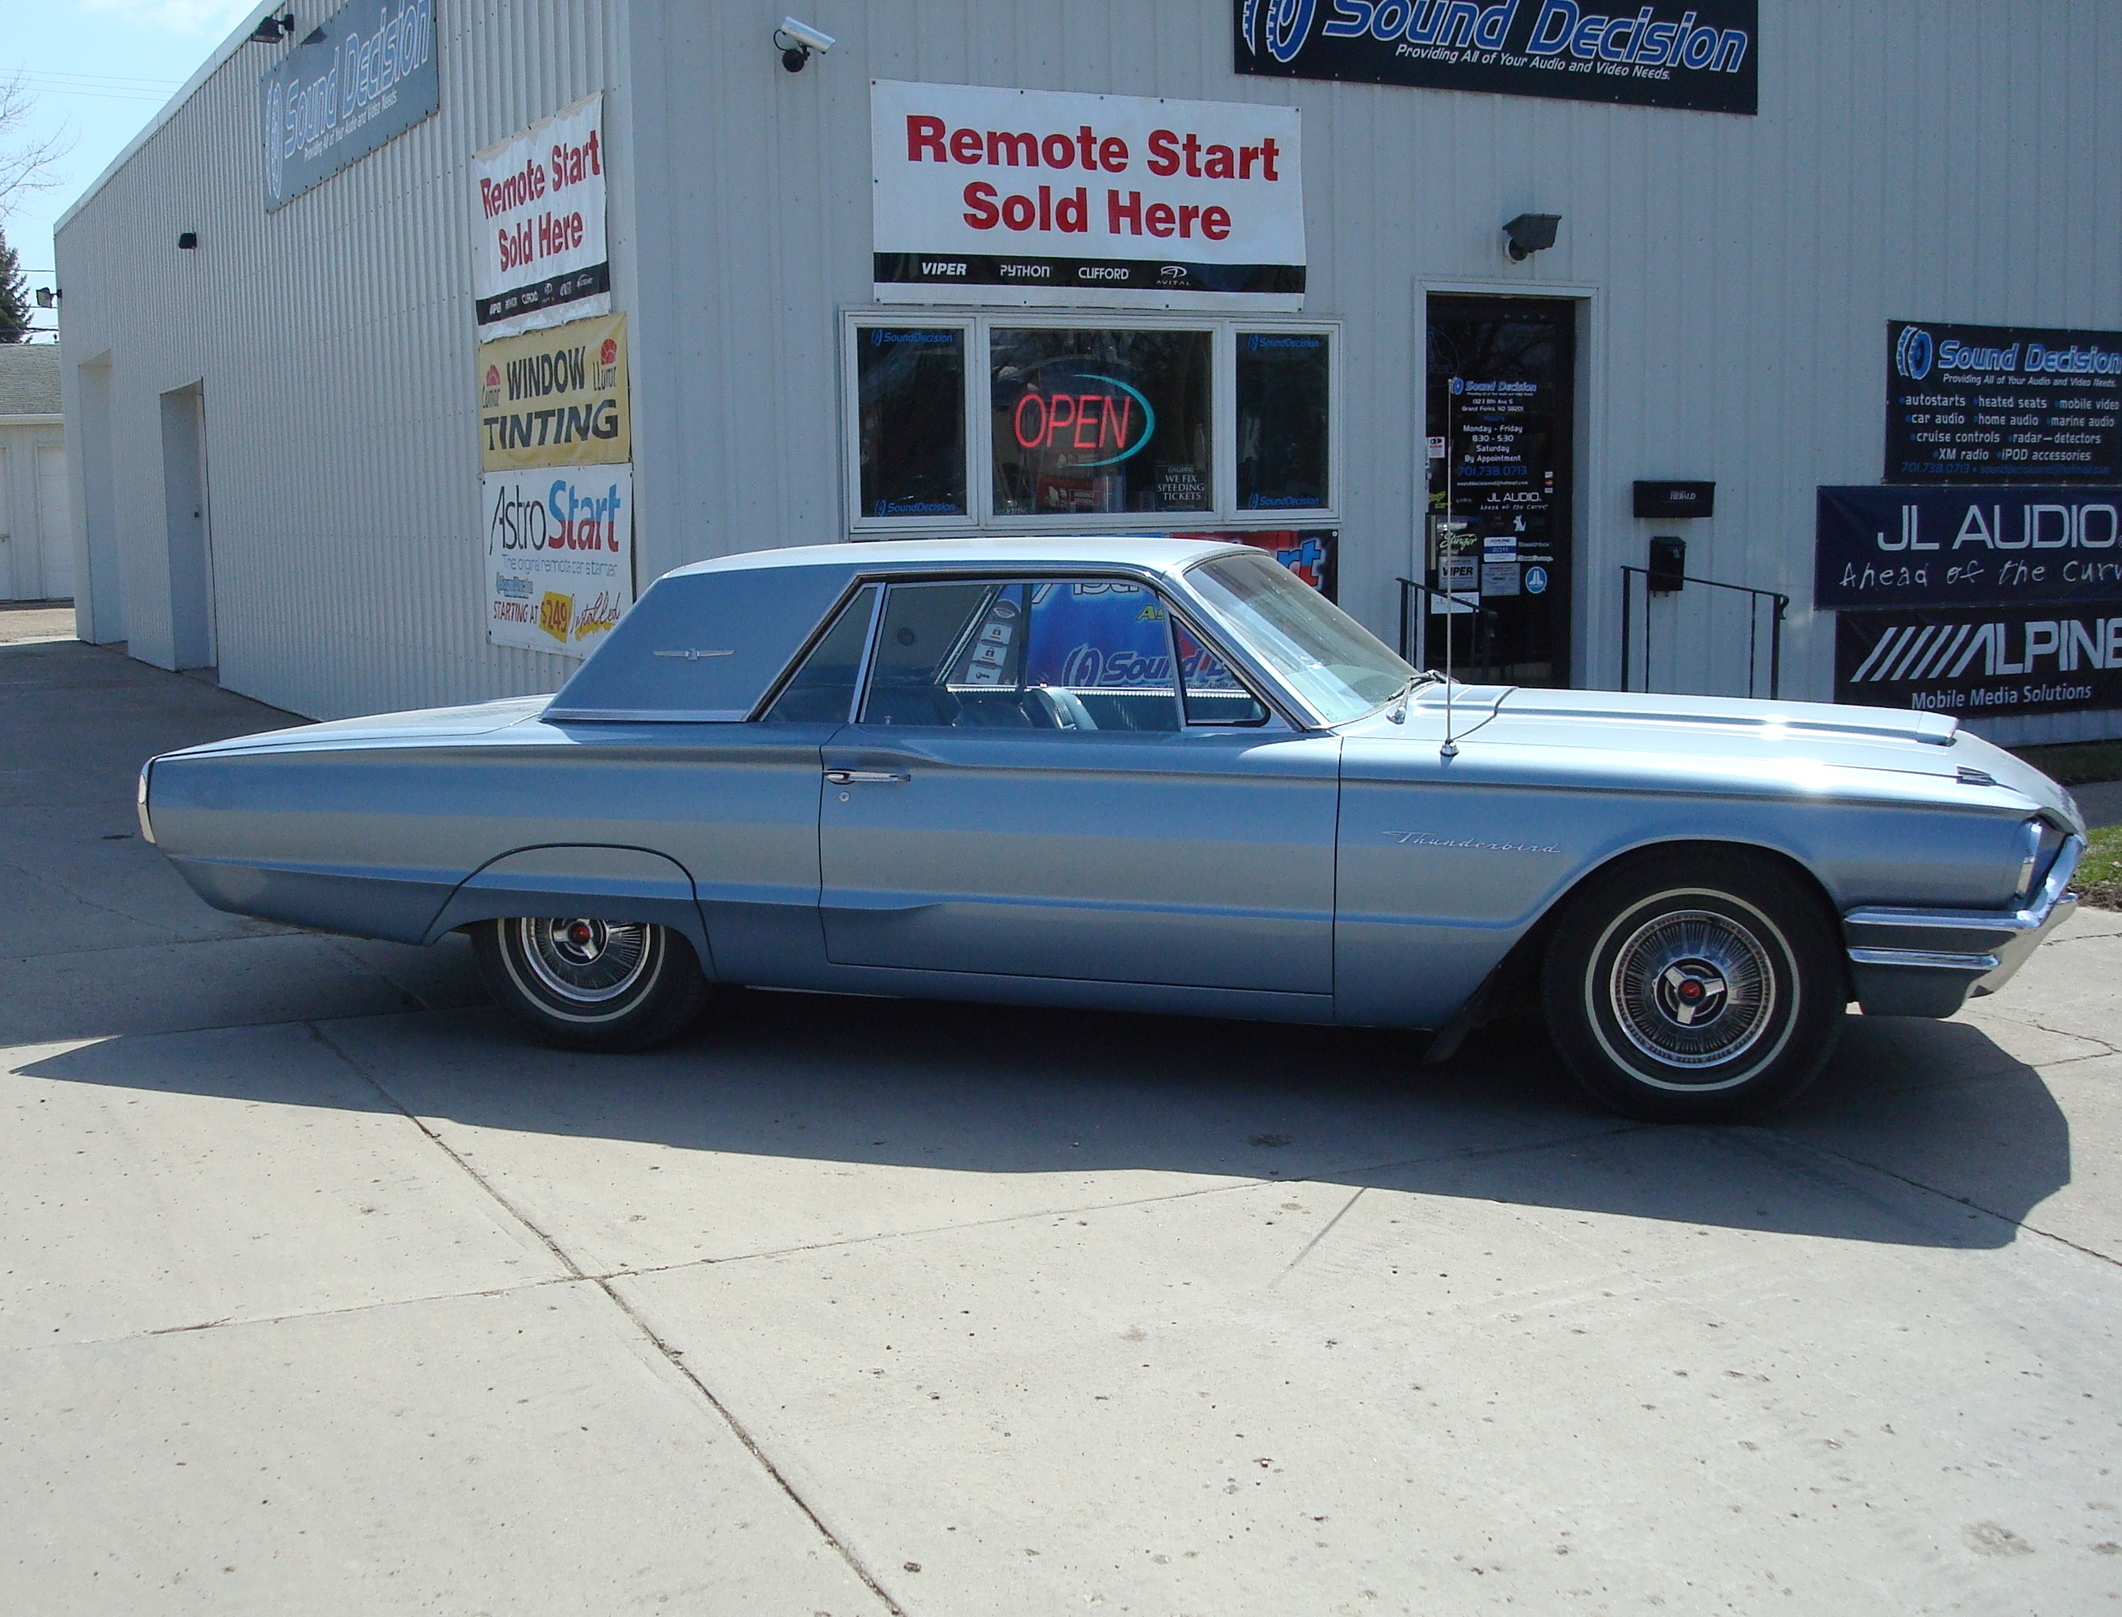 1964 Thunderbird - Custom Autosounds Factory-Look Radio, Front Kick Panel Speakers & Rear Deck Speakers